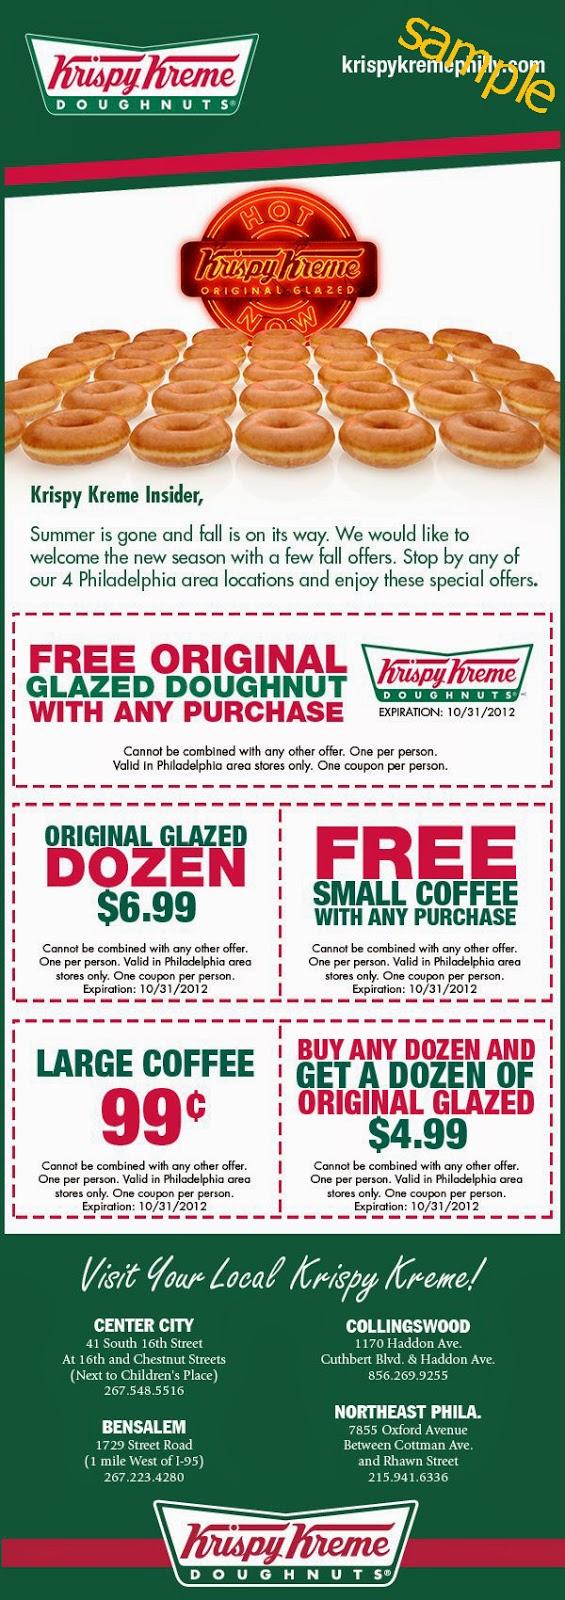 Krispy kreme printable coupons uk